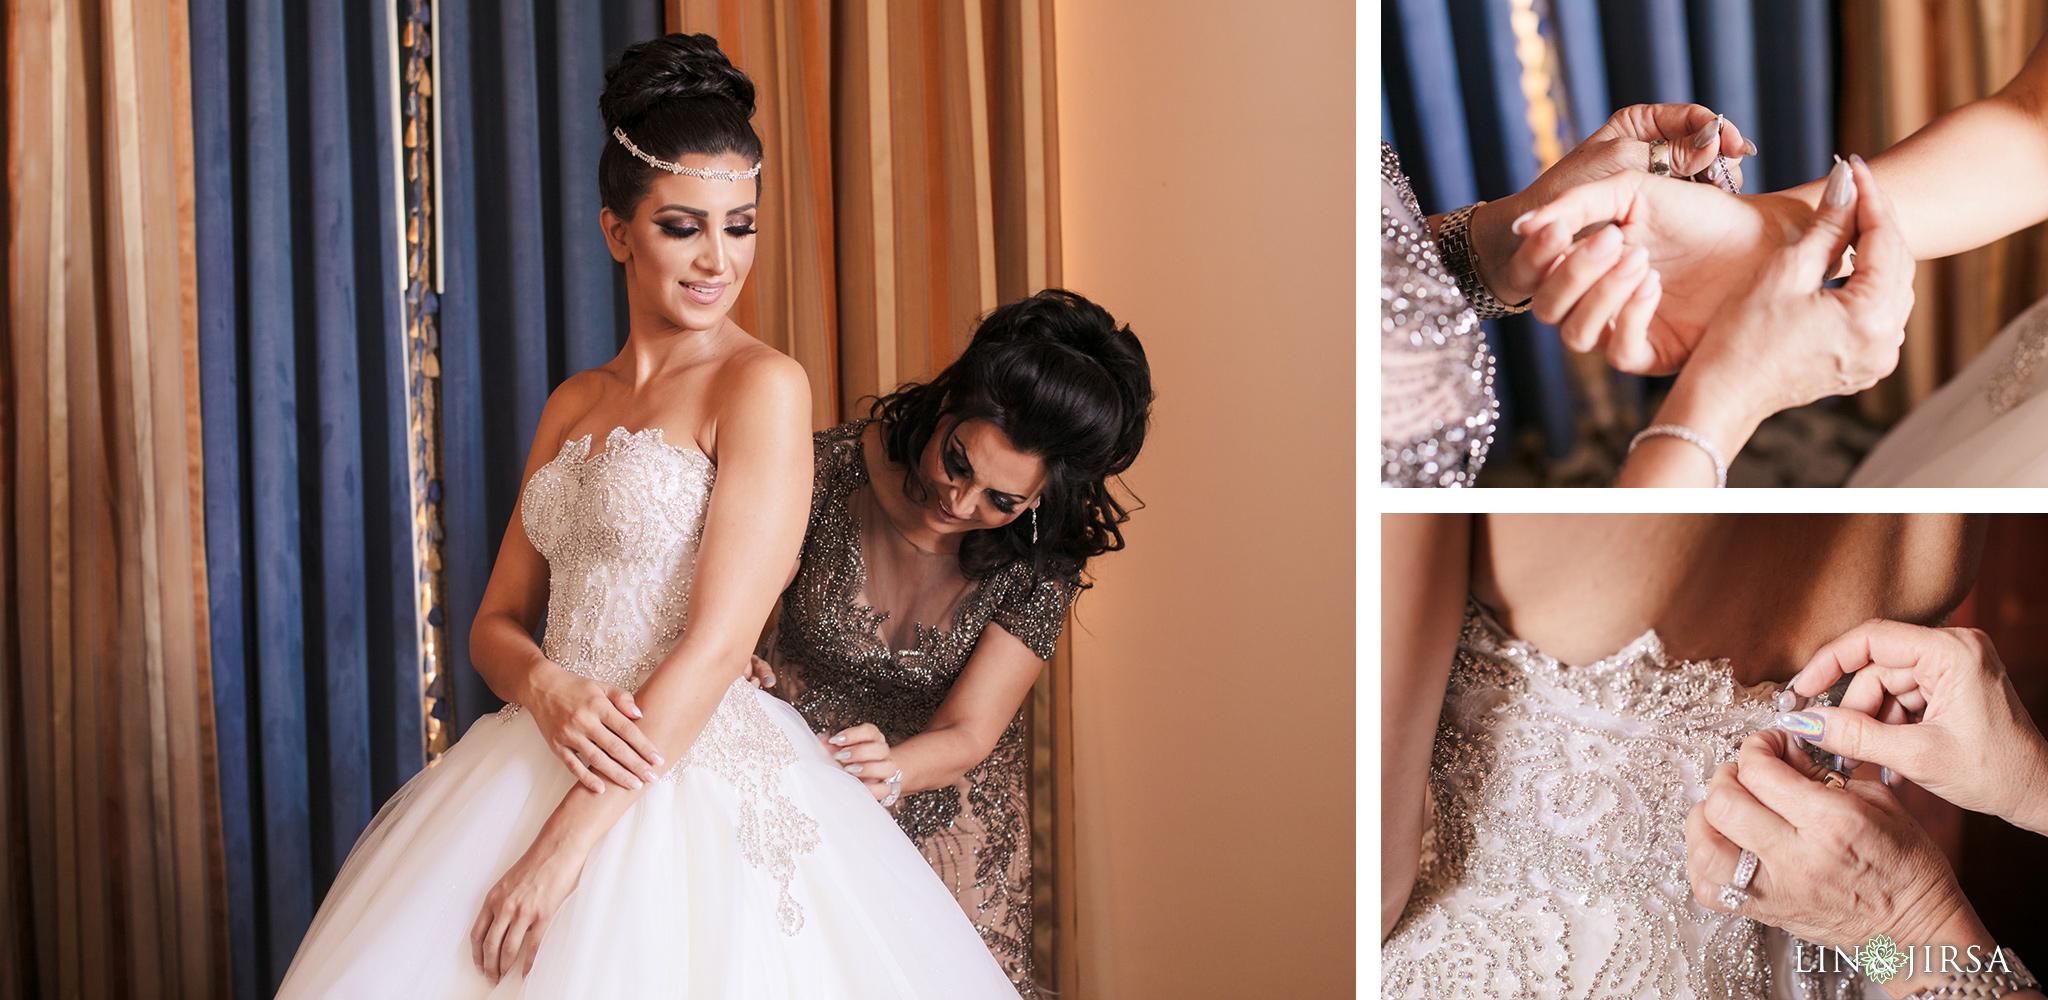 03 Biltmore Hotel Los Angeles Wedding Photography